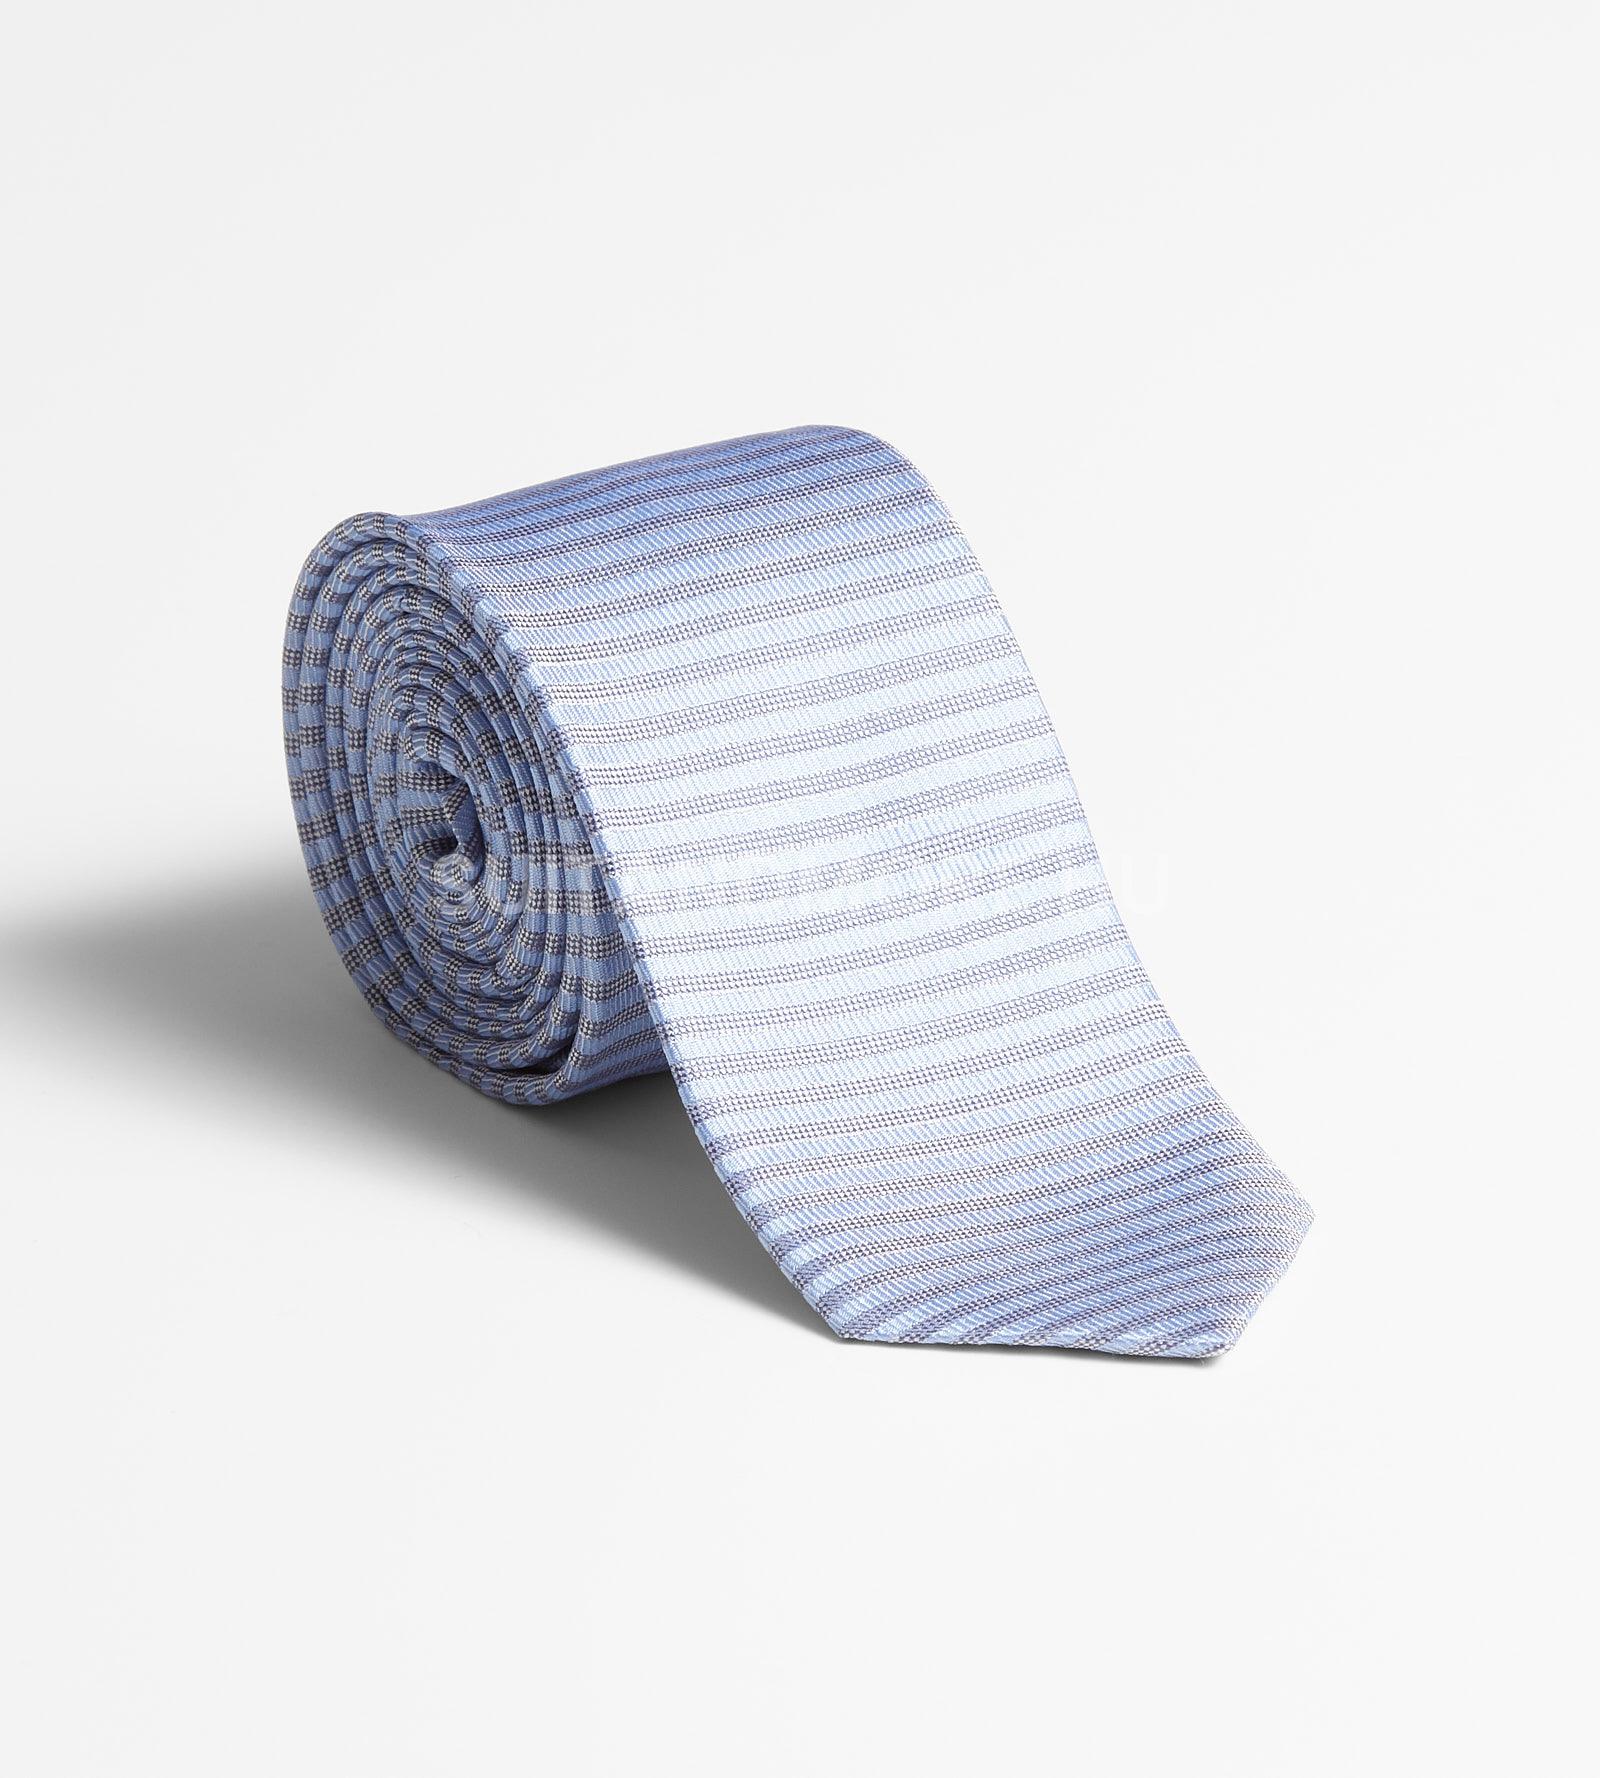 digel-vilagoskek-csikos-selyem-nyakkendo-dunhill-1179009-25-01